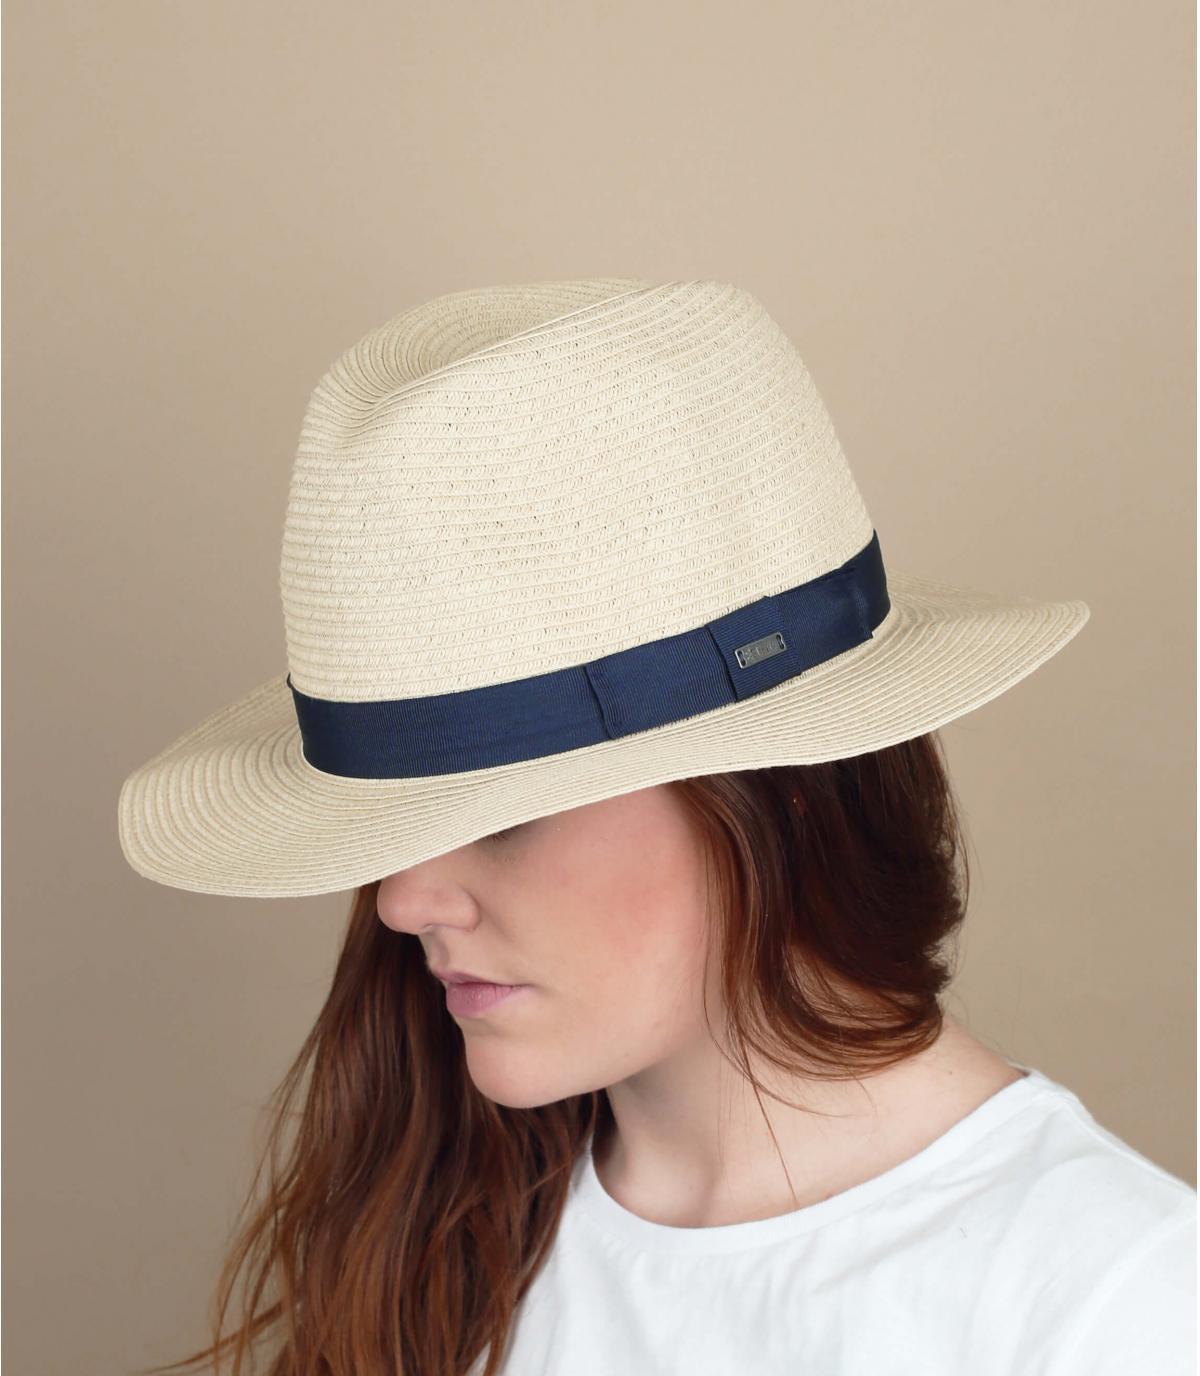 Strohhut beige Band blau